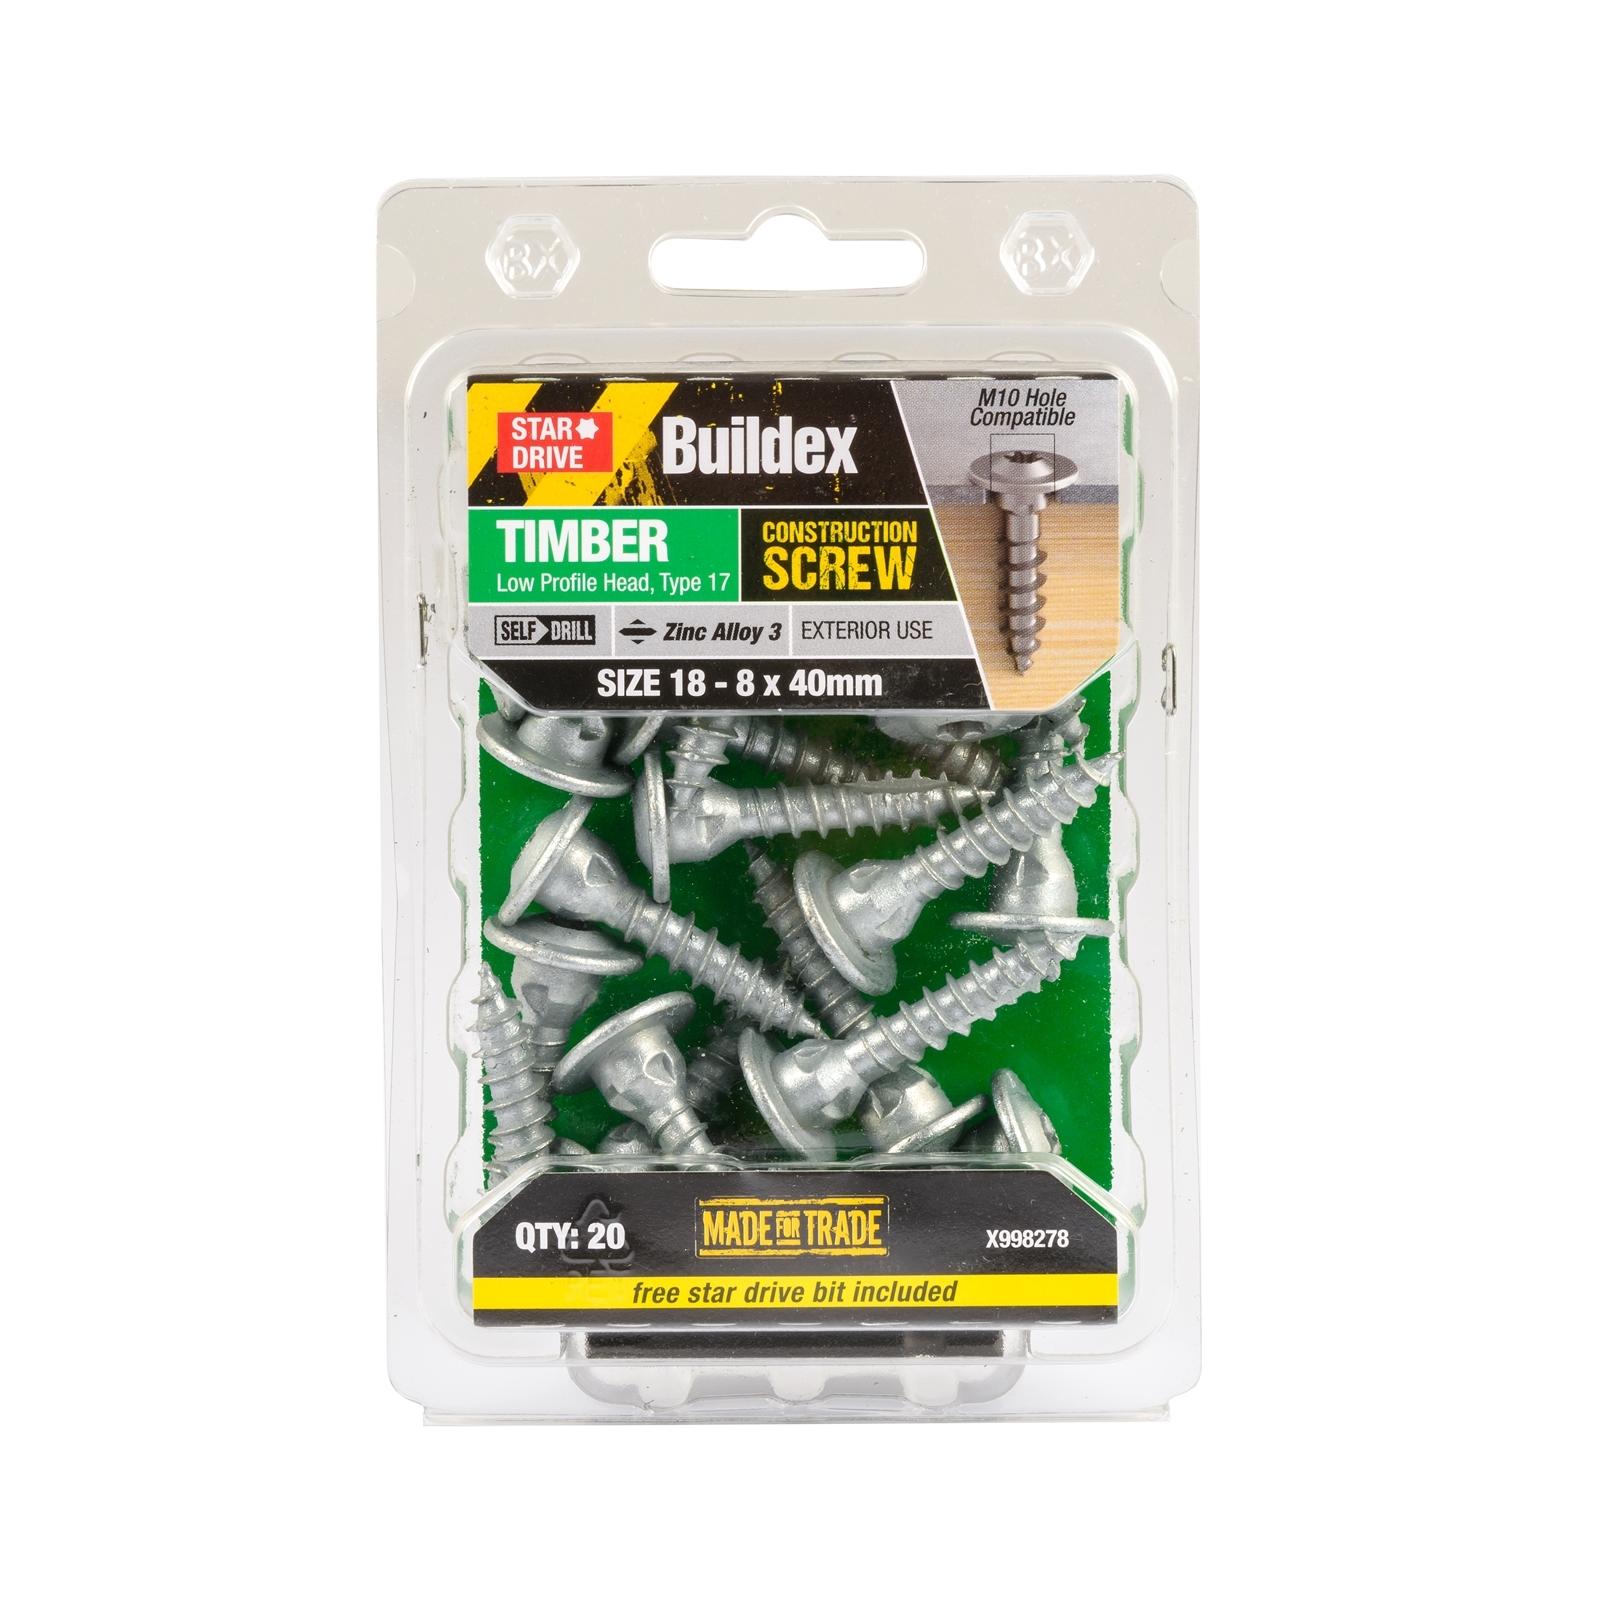 Buildex® 18 - 8 x 40mm Zinc Alloy 3 Star Head Timber Construction Screws - 20 Pack